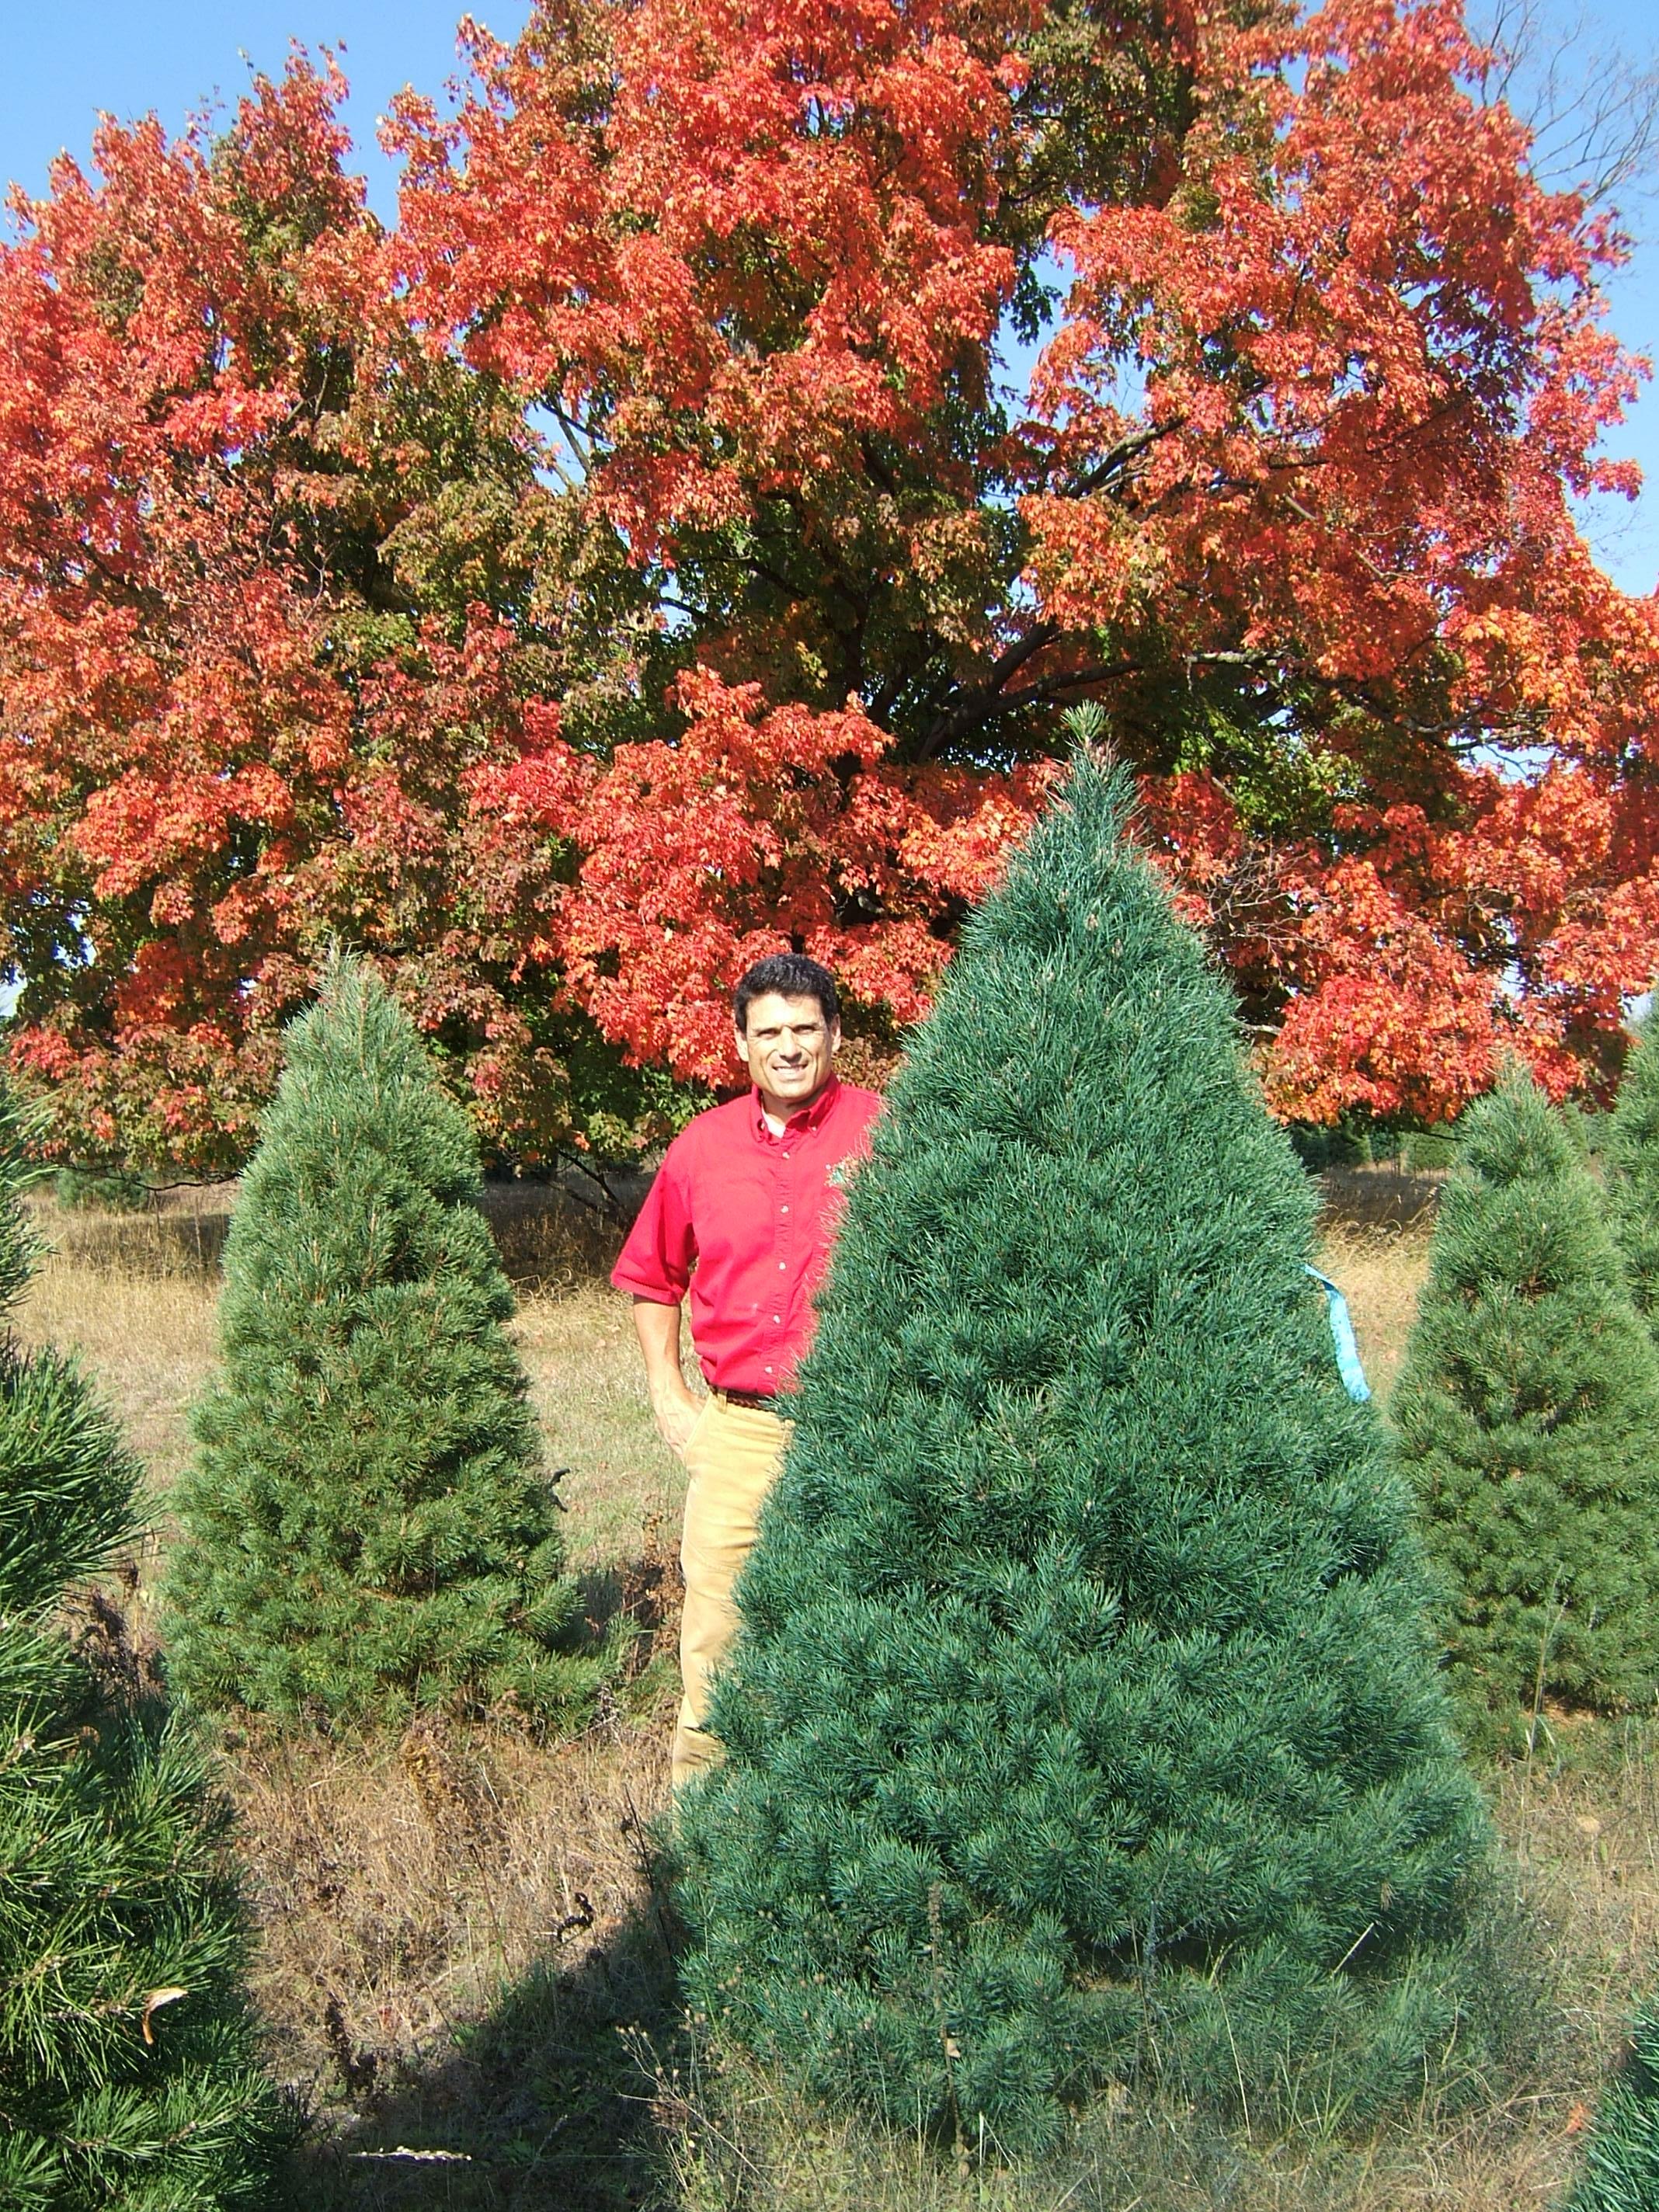 Big John's Christmas Trees - Trees